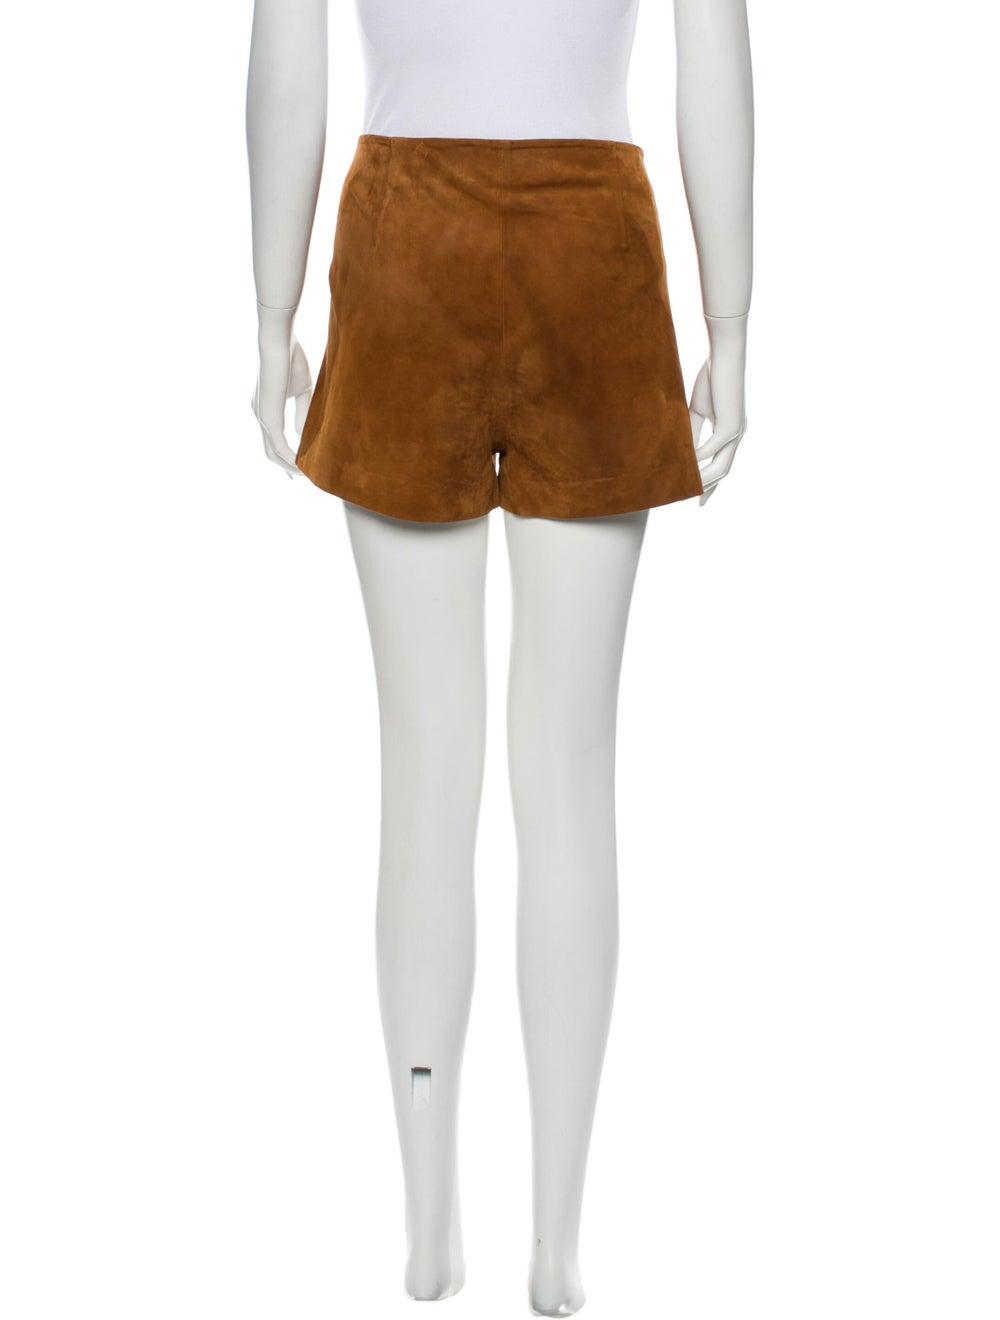 Rag & Bone Goat Leather Mini Shorts Brown - image 3